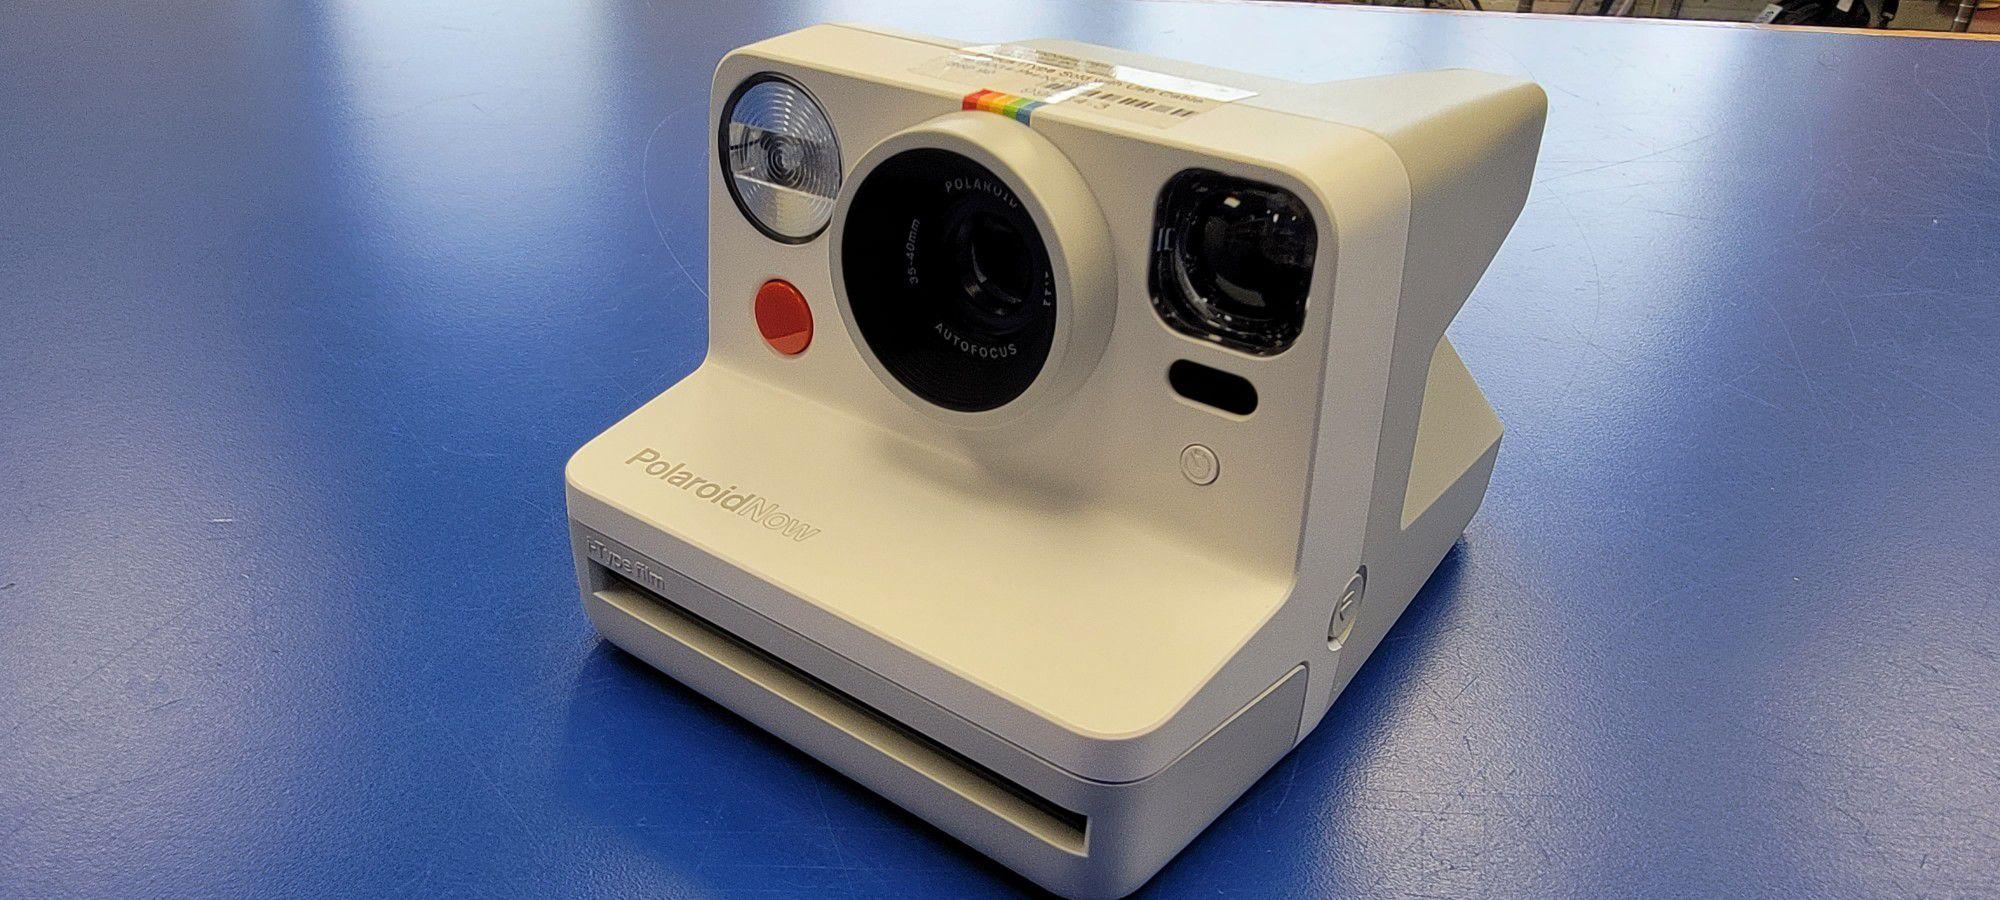 Polaroid Instant Camera 9027